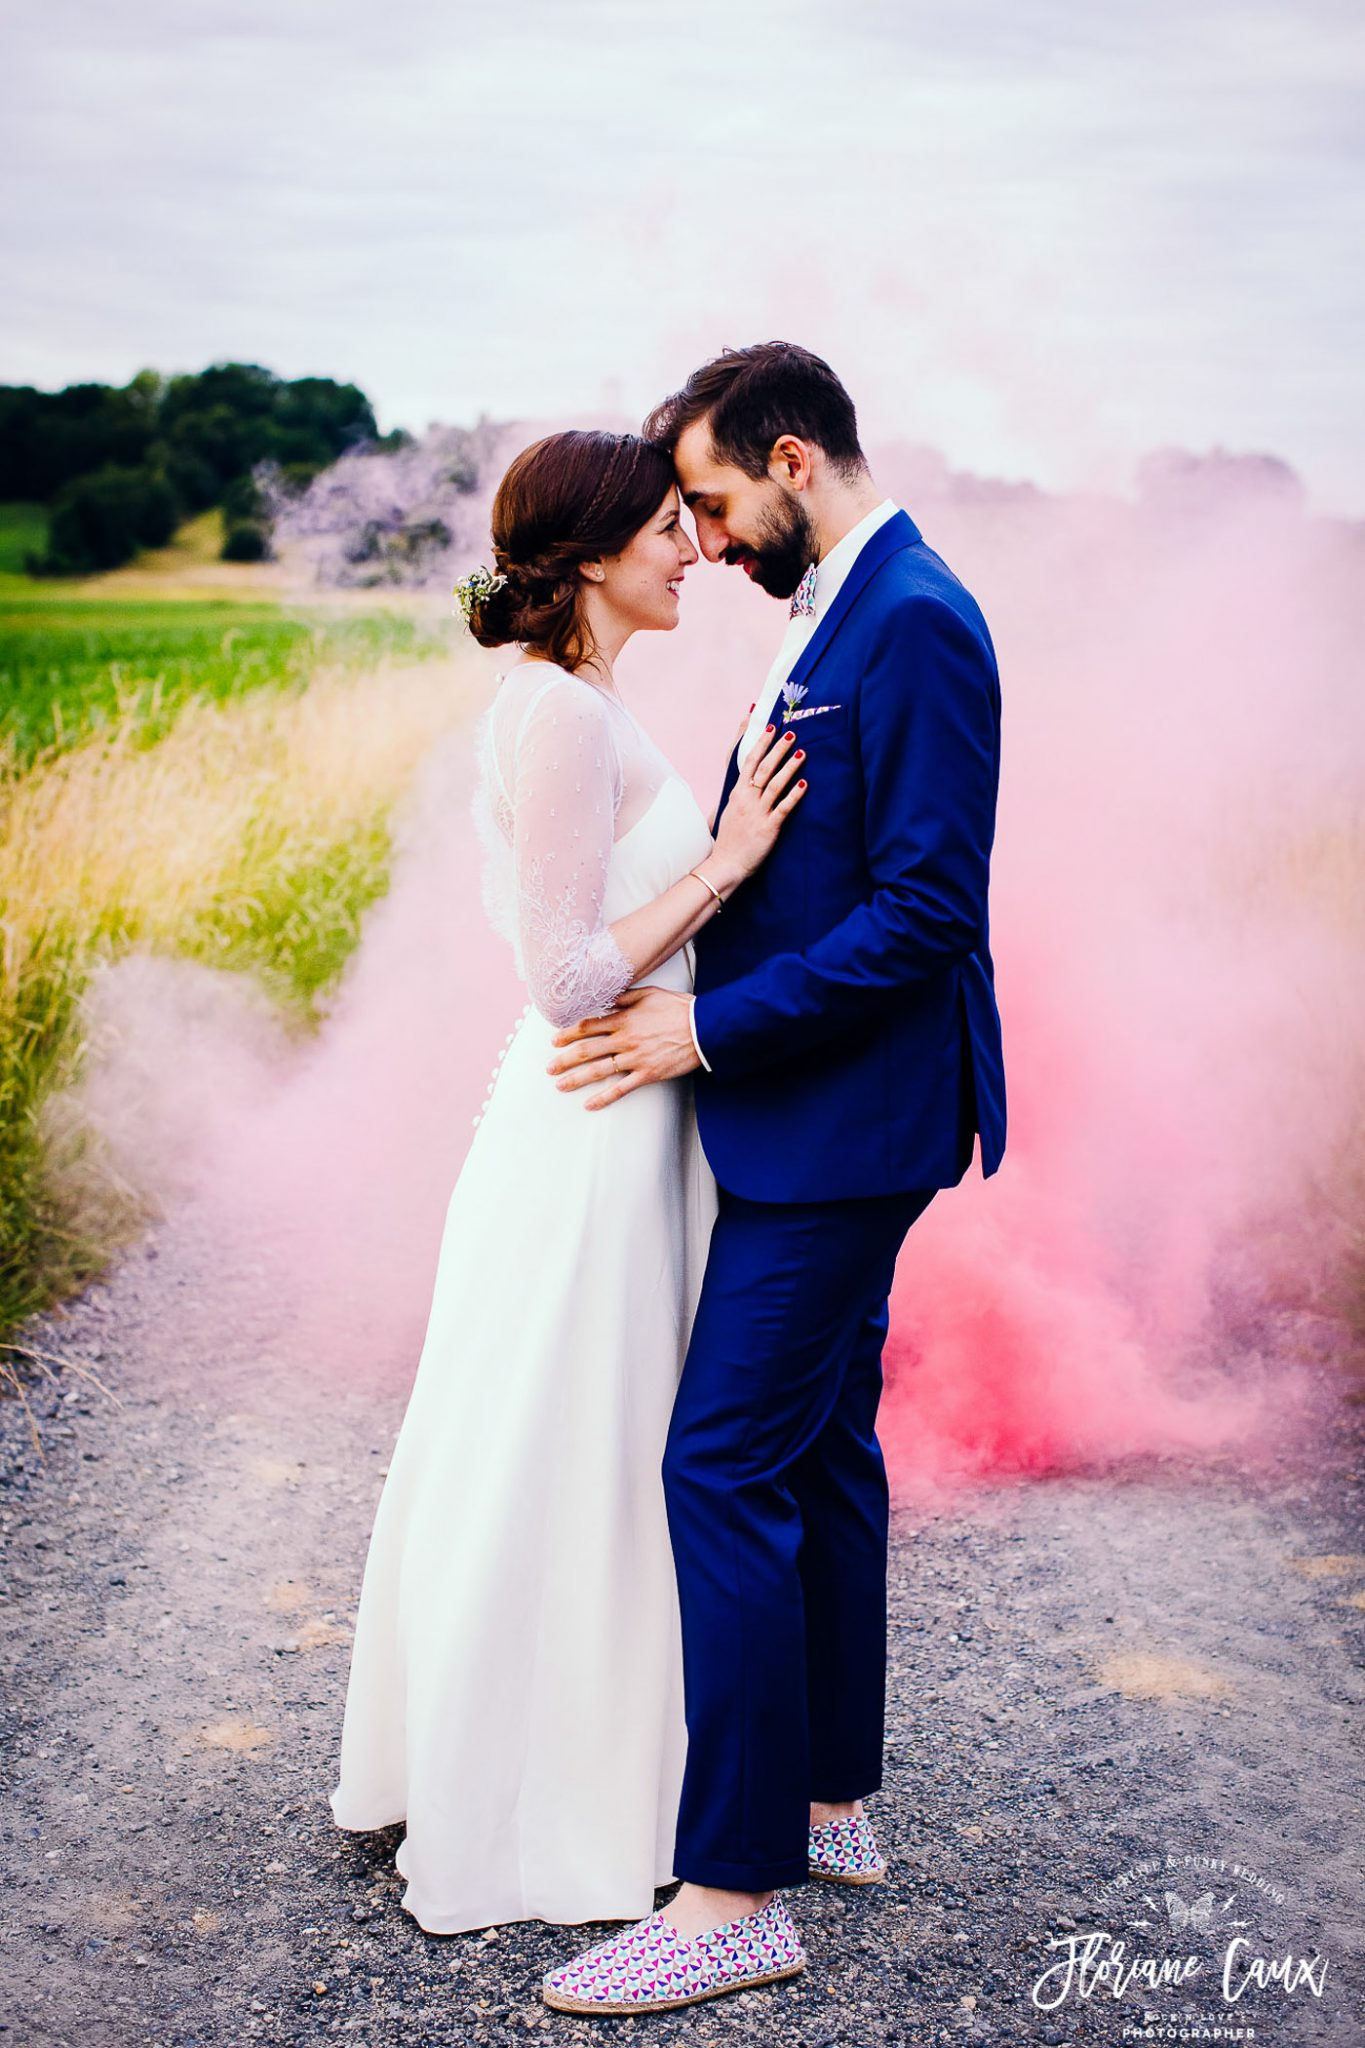 photographe-mariage-pays-basque-Floriane-Caux (53)